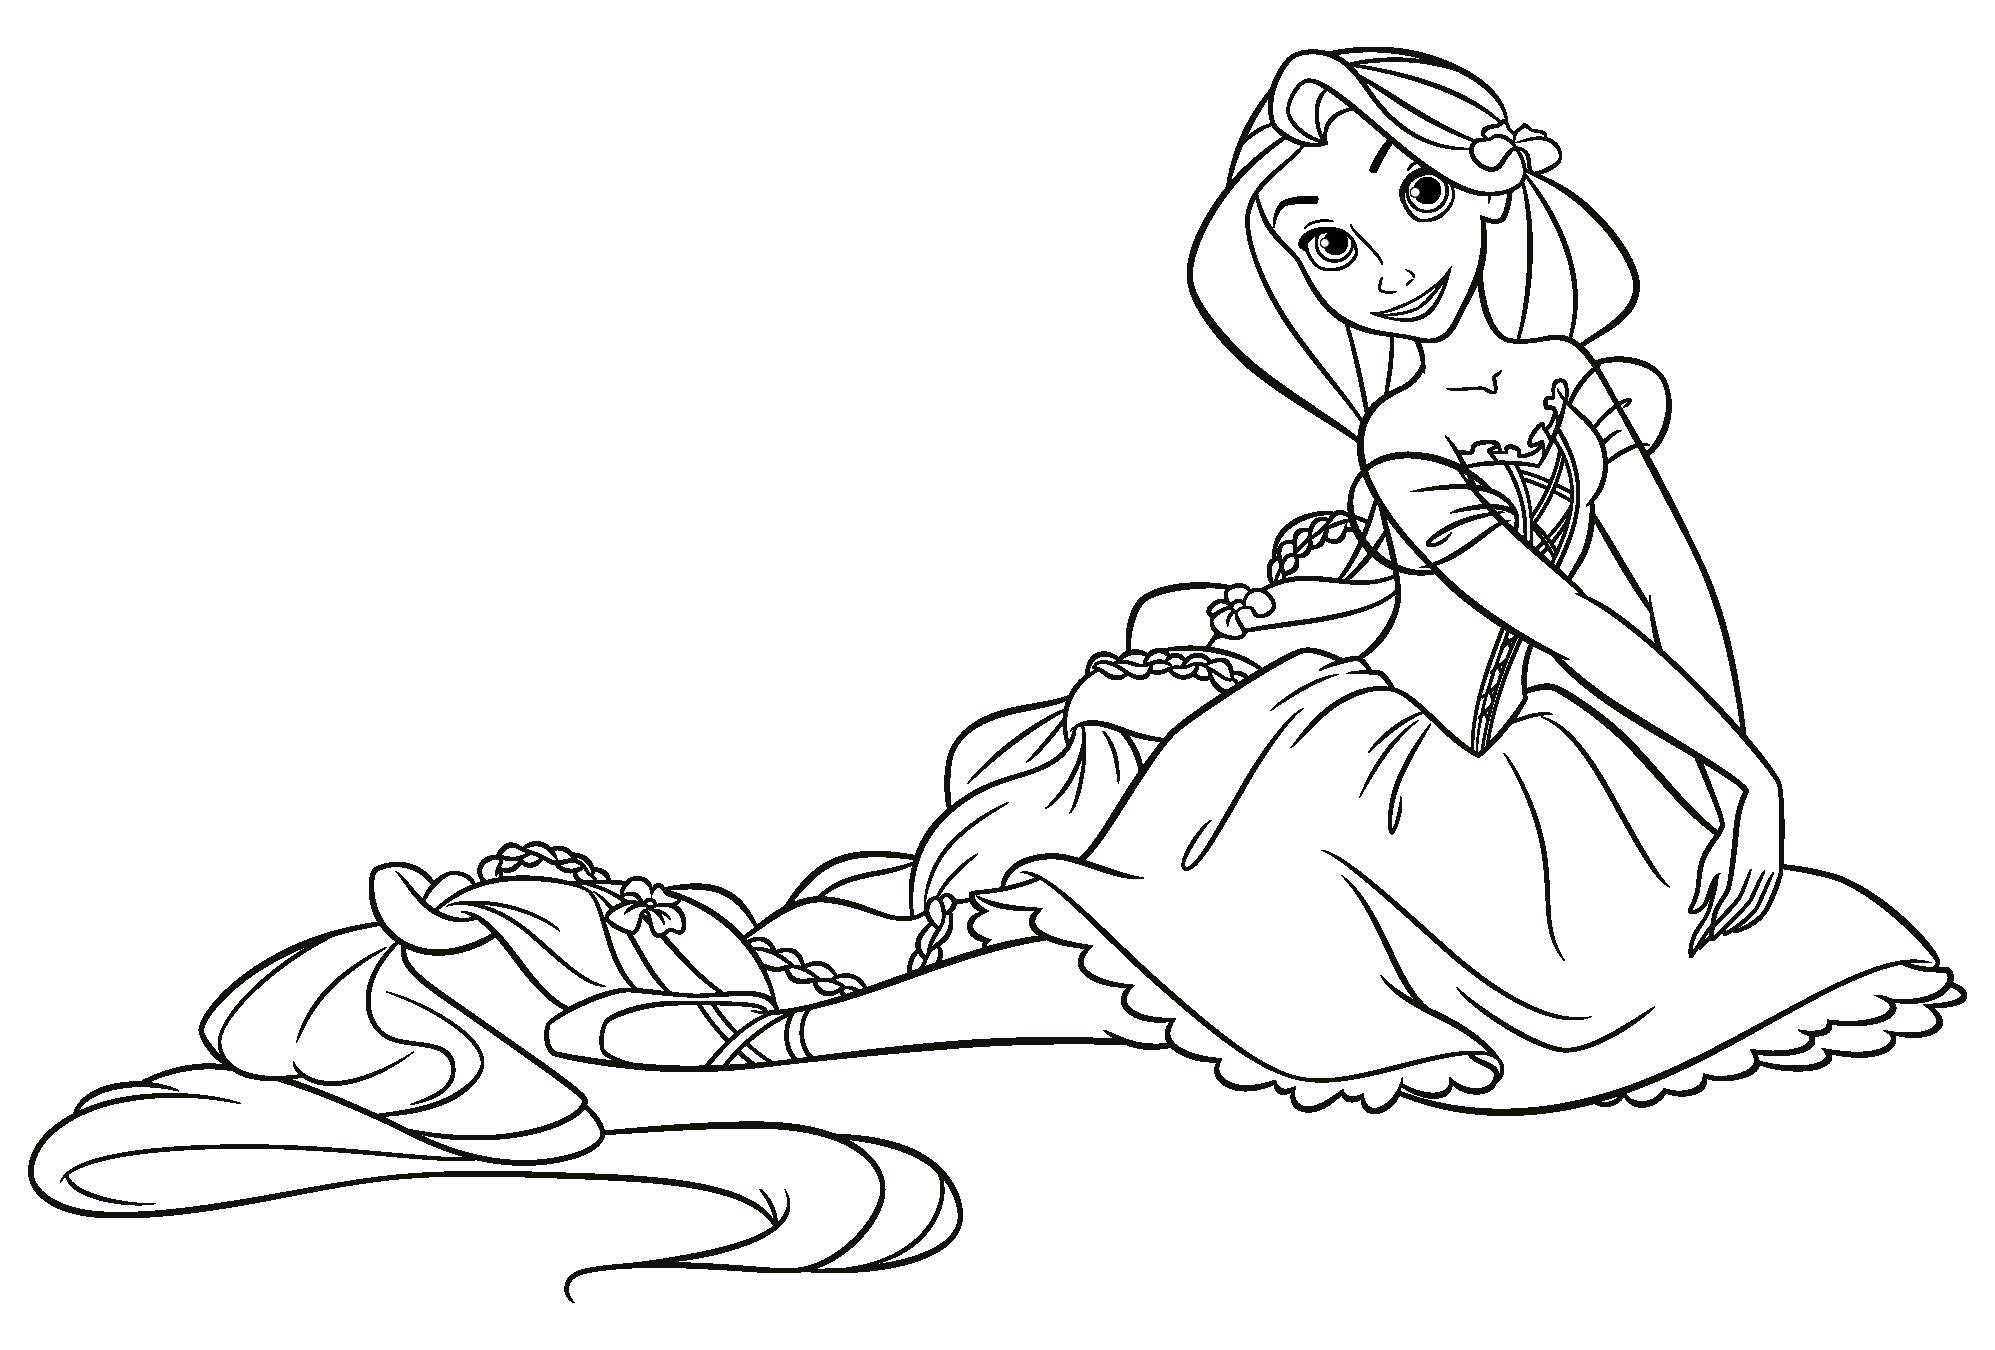 Раскраска Рапунцель балерина, раскраска для девочек. Рапунцель